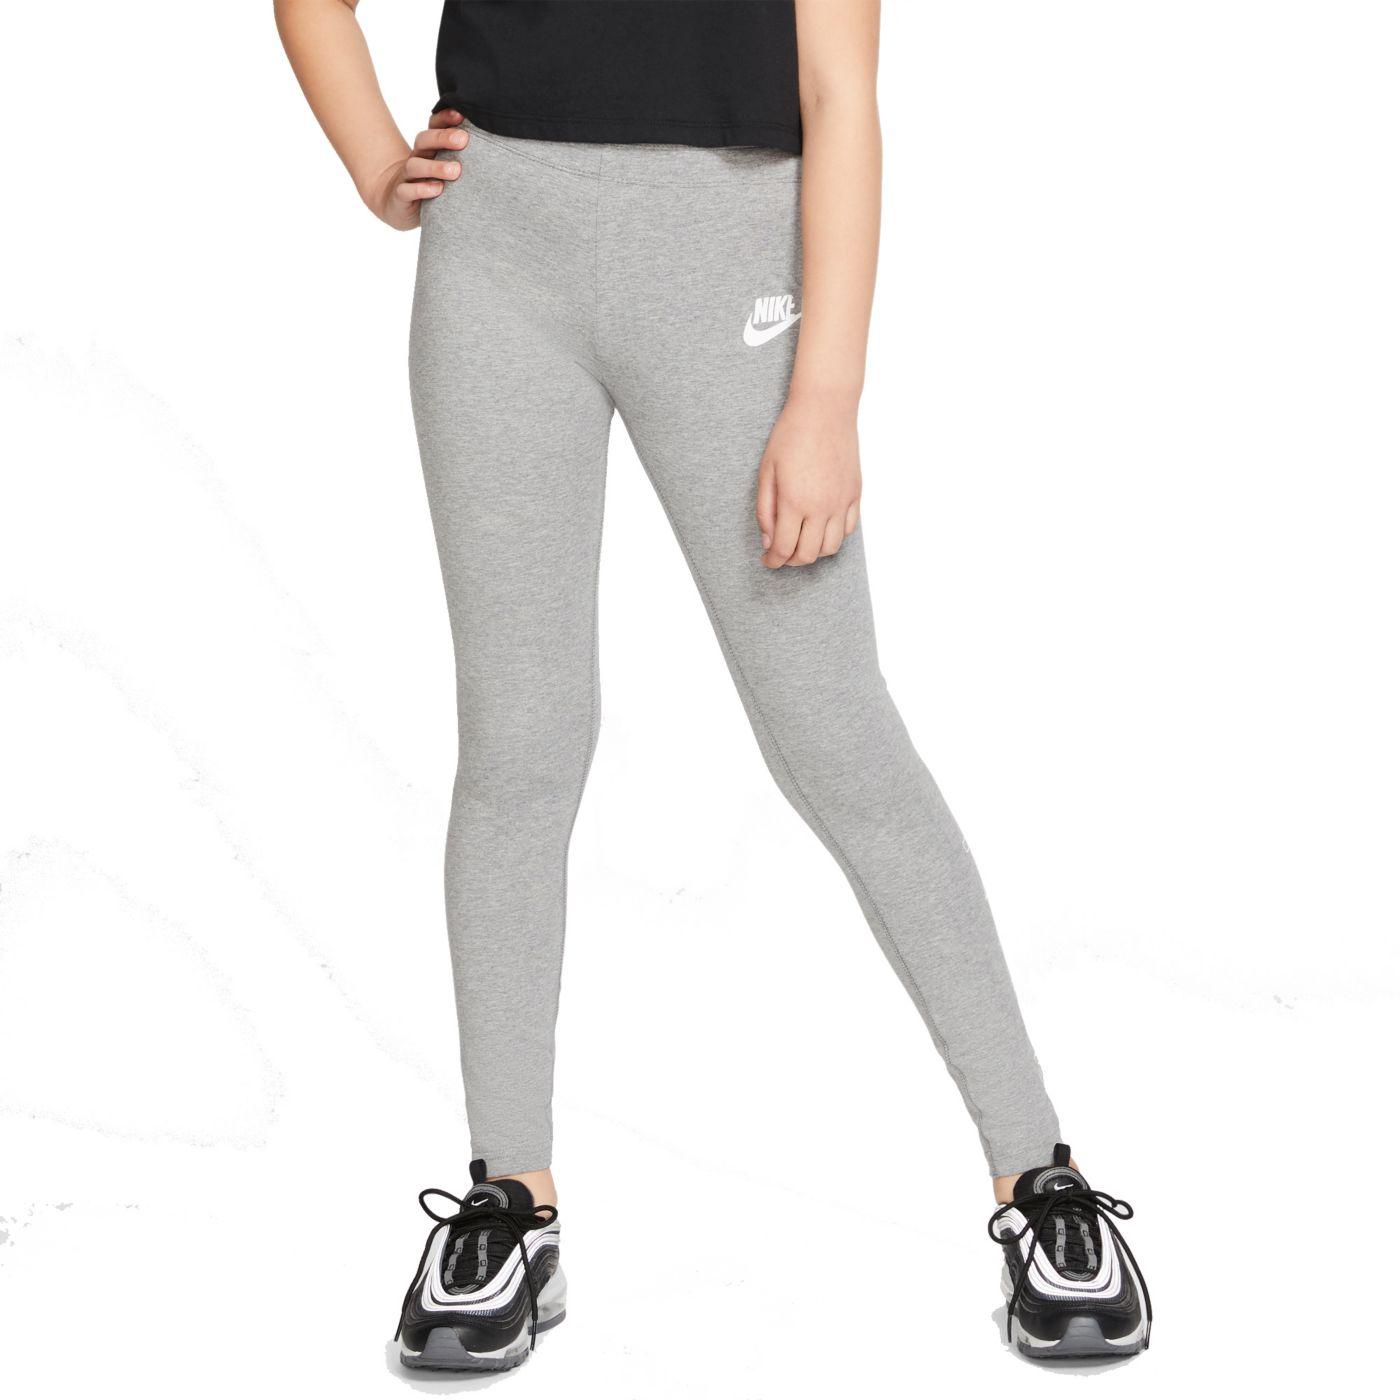 Nike Girls' Sportswear High Brand Read Leggings